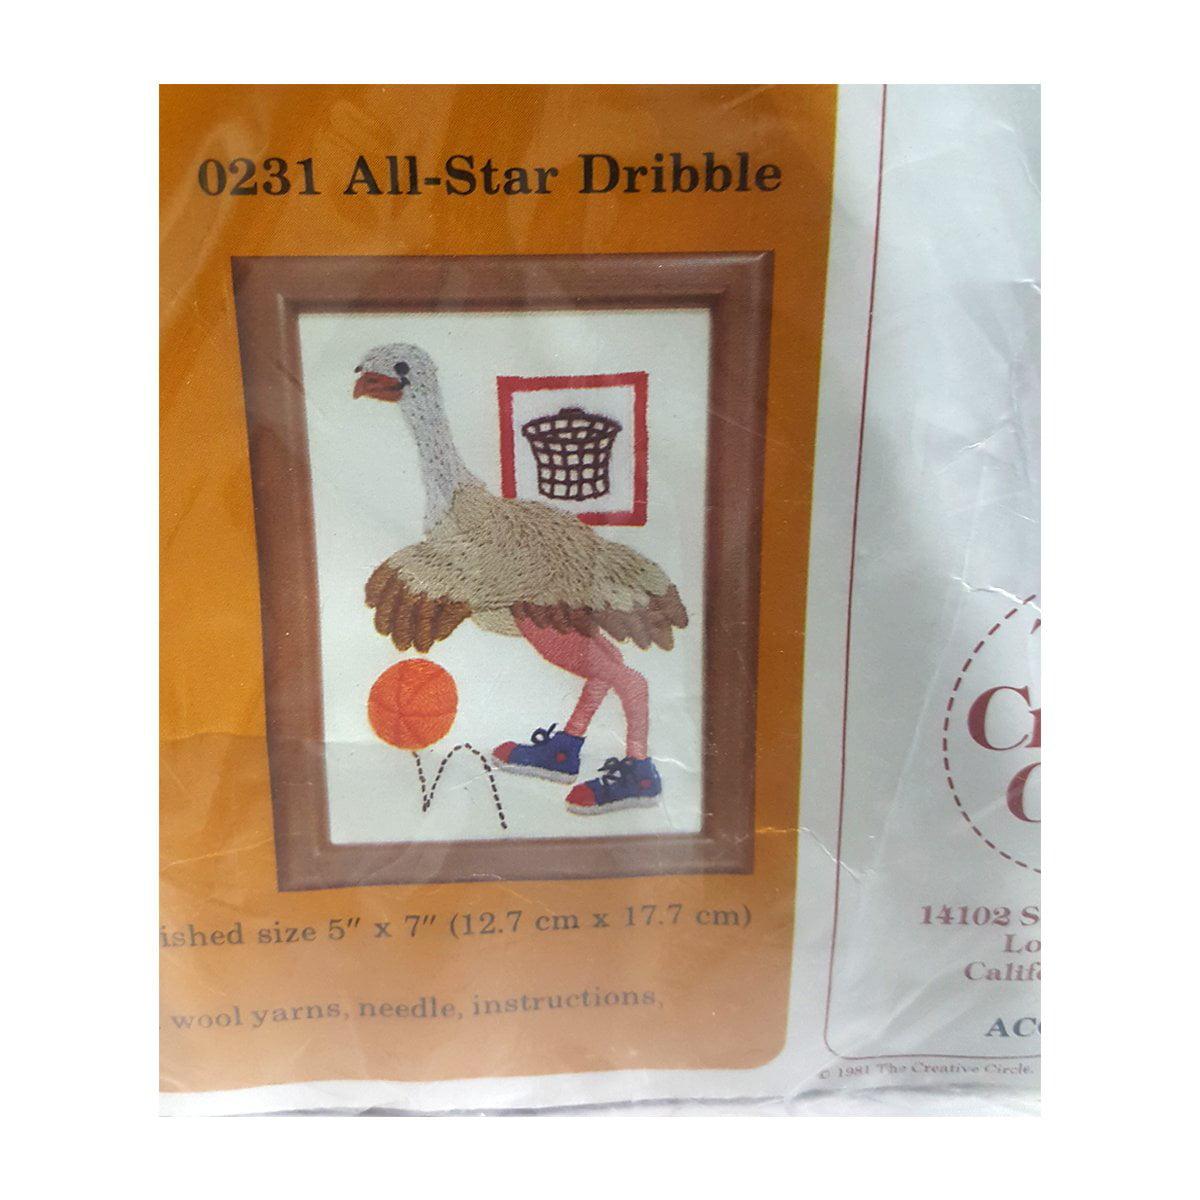 1981 The Creative Circle All-Star Dribble Stitchery Kit No